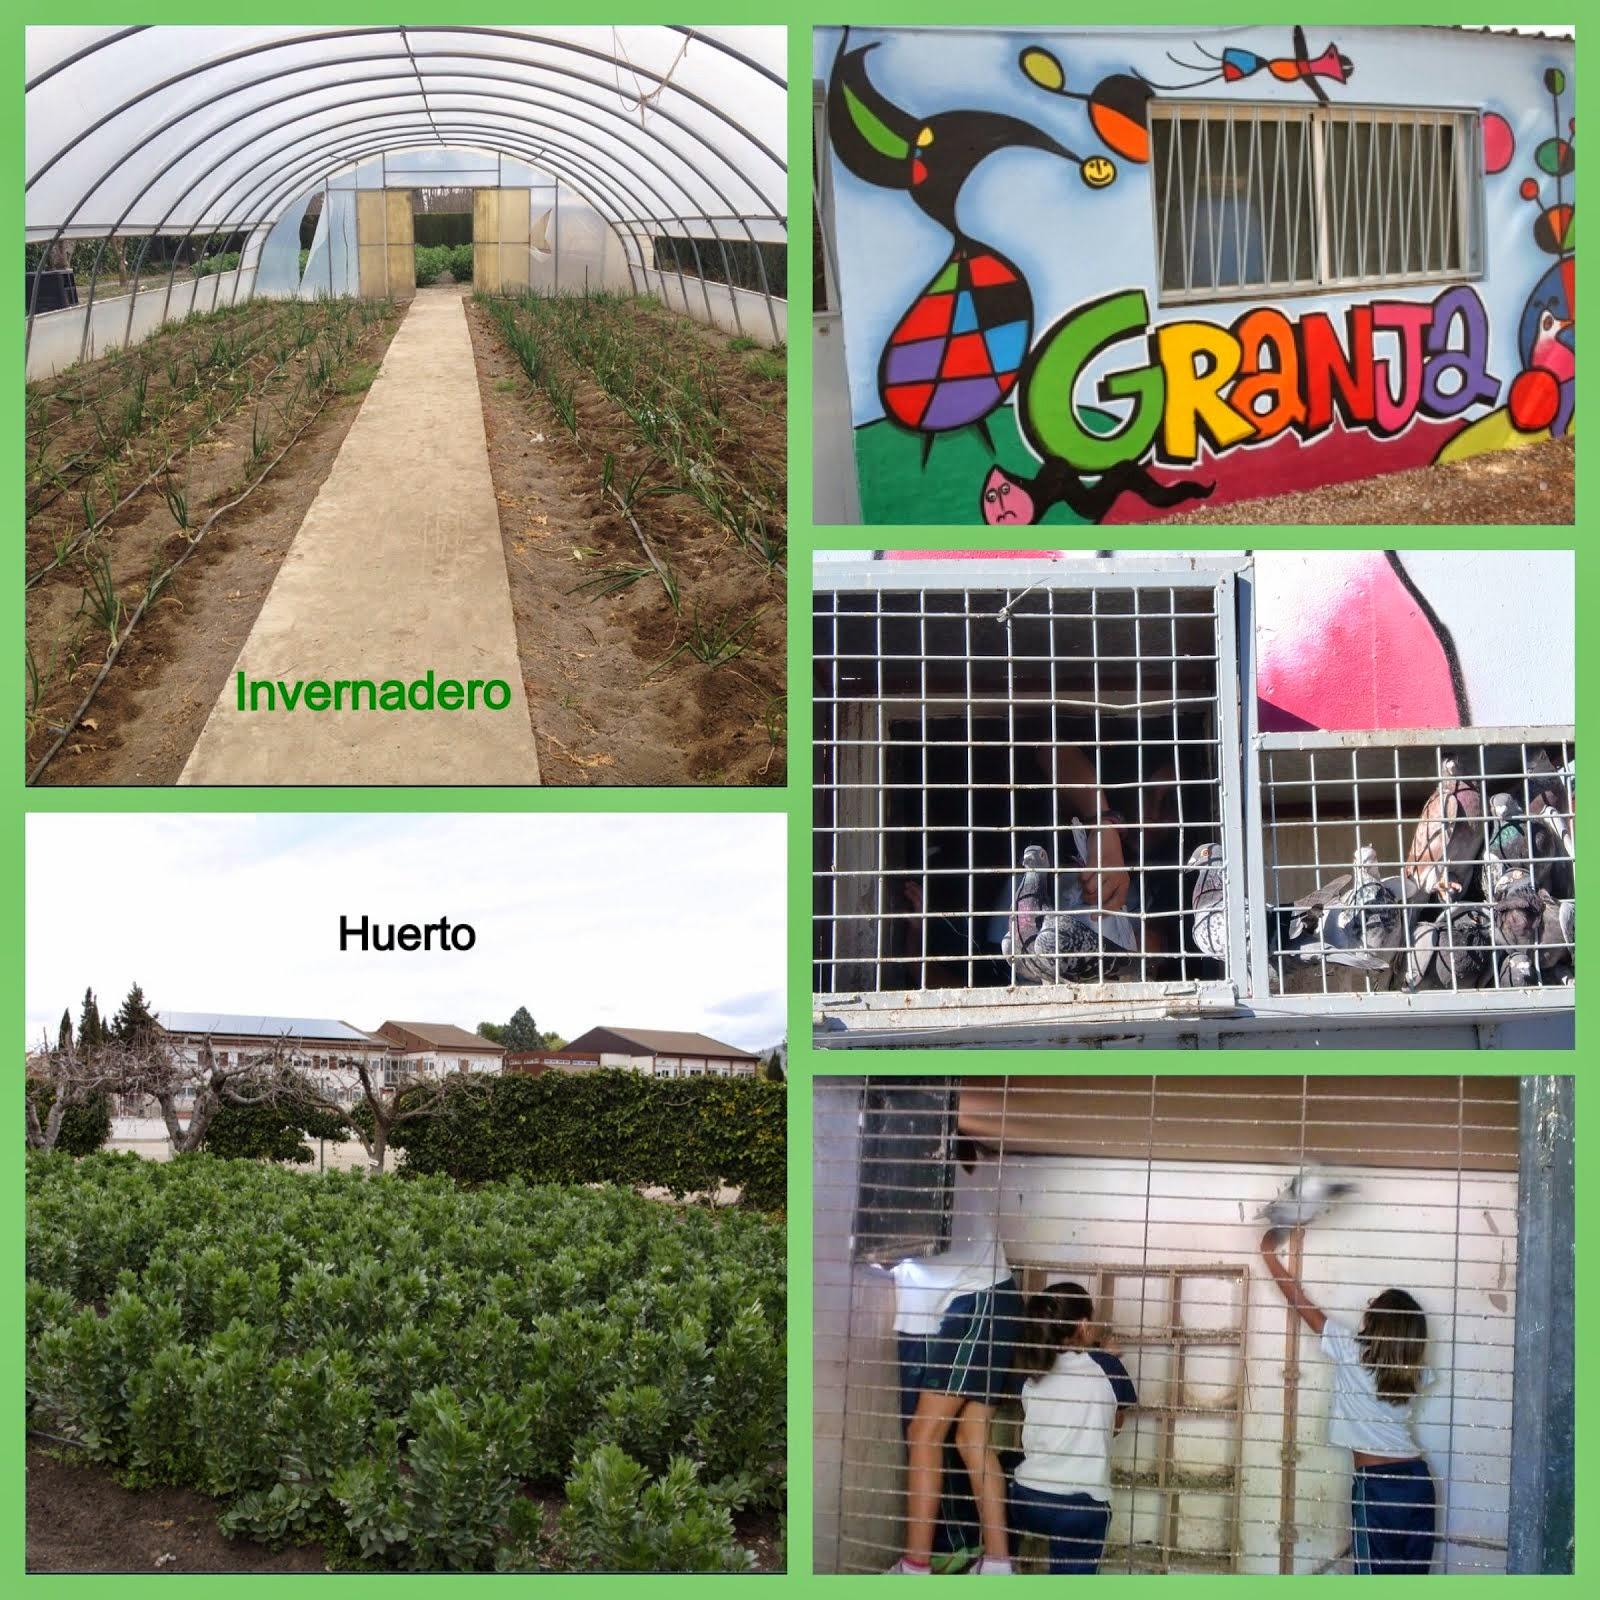 Huerto, granja e invernadero